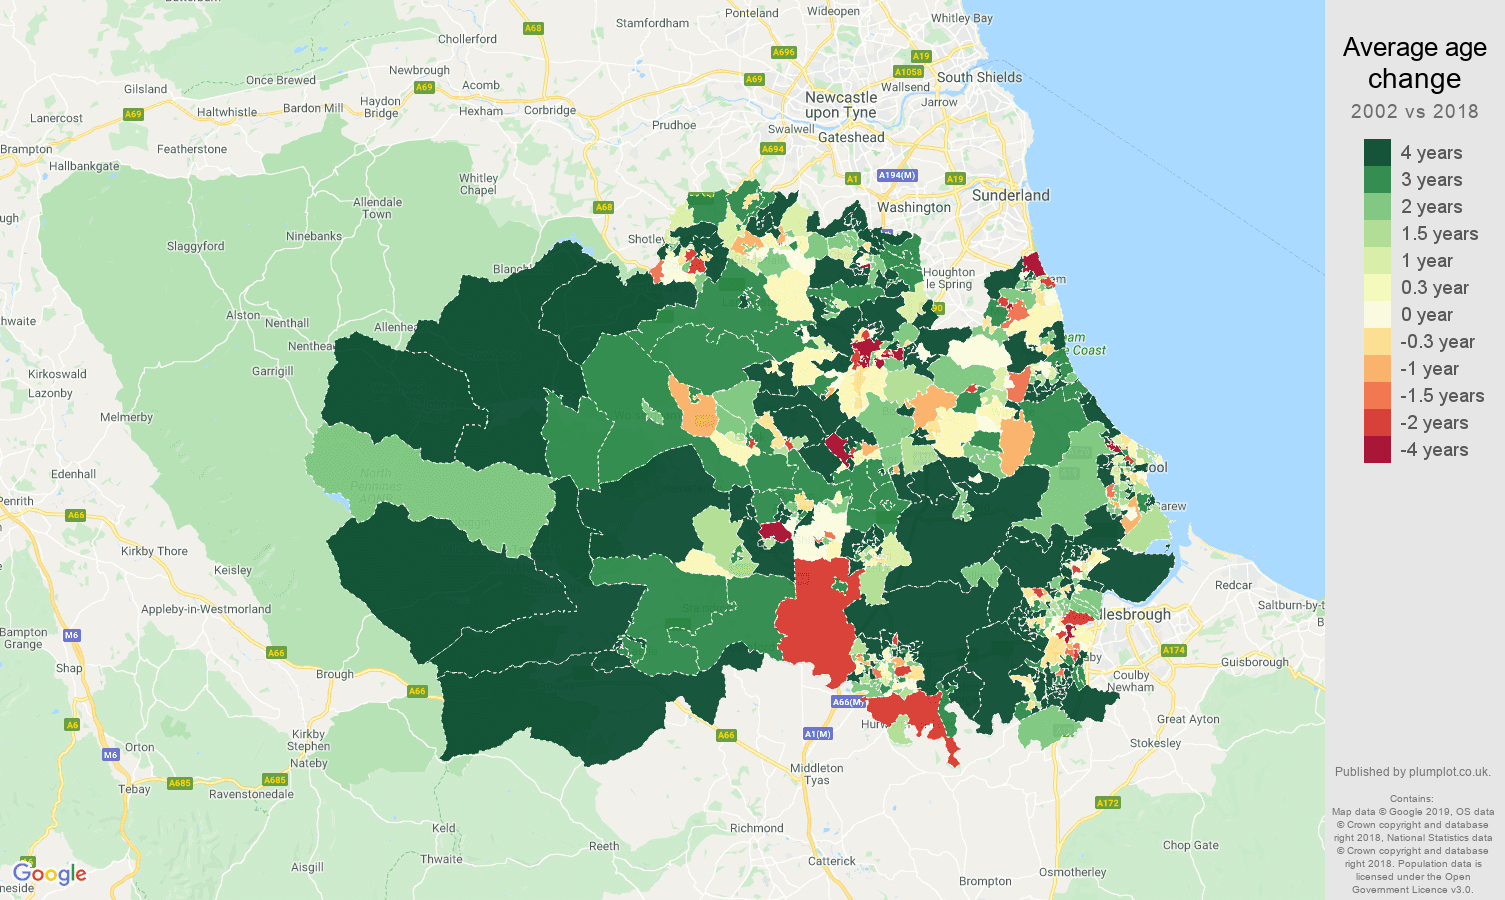 Durham county average age change map